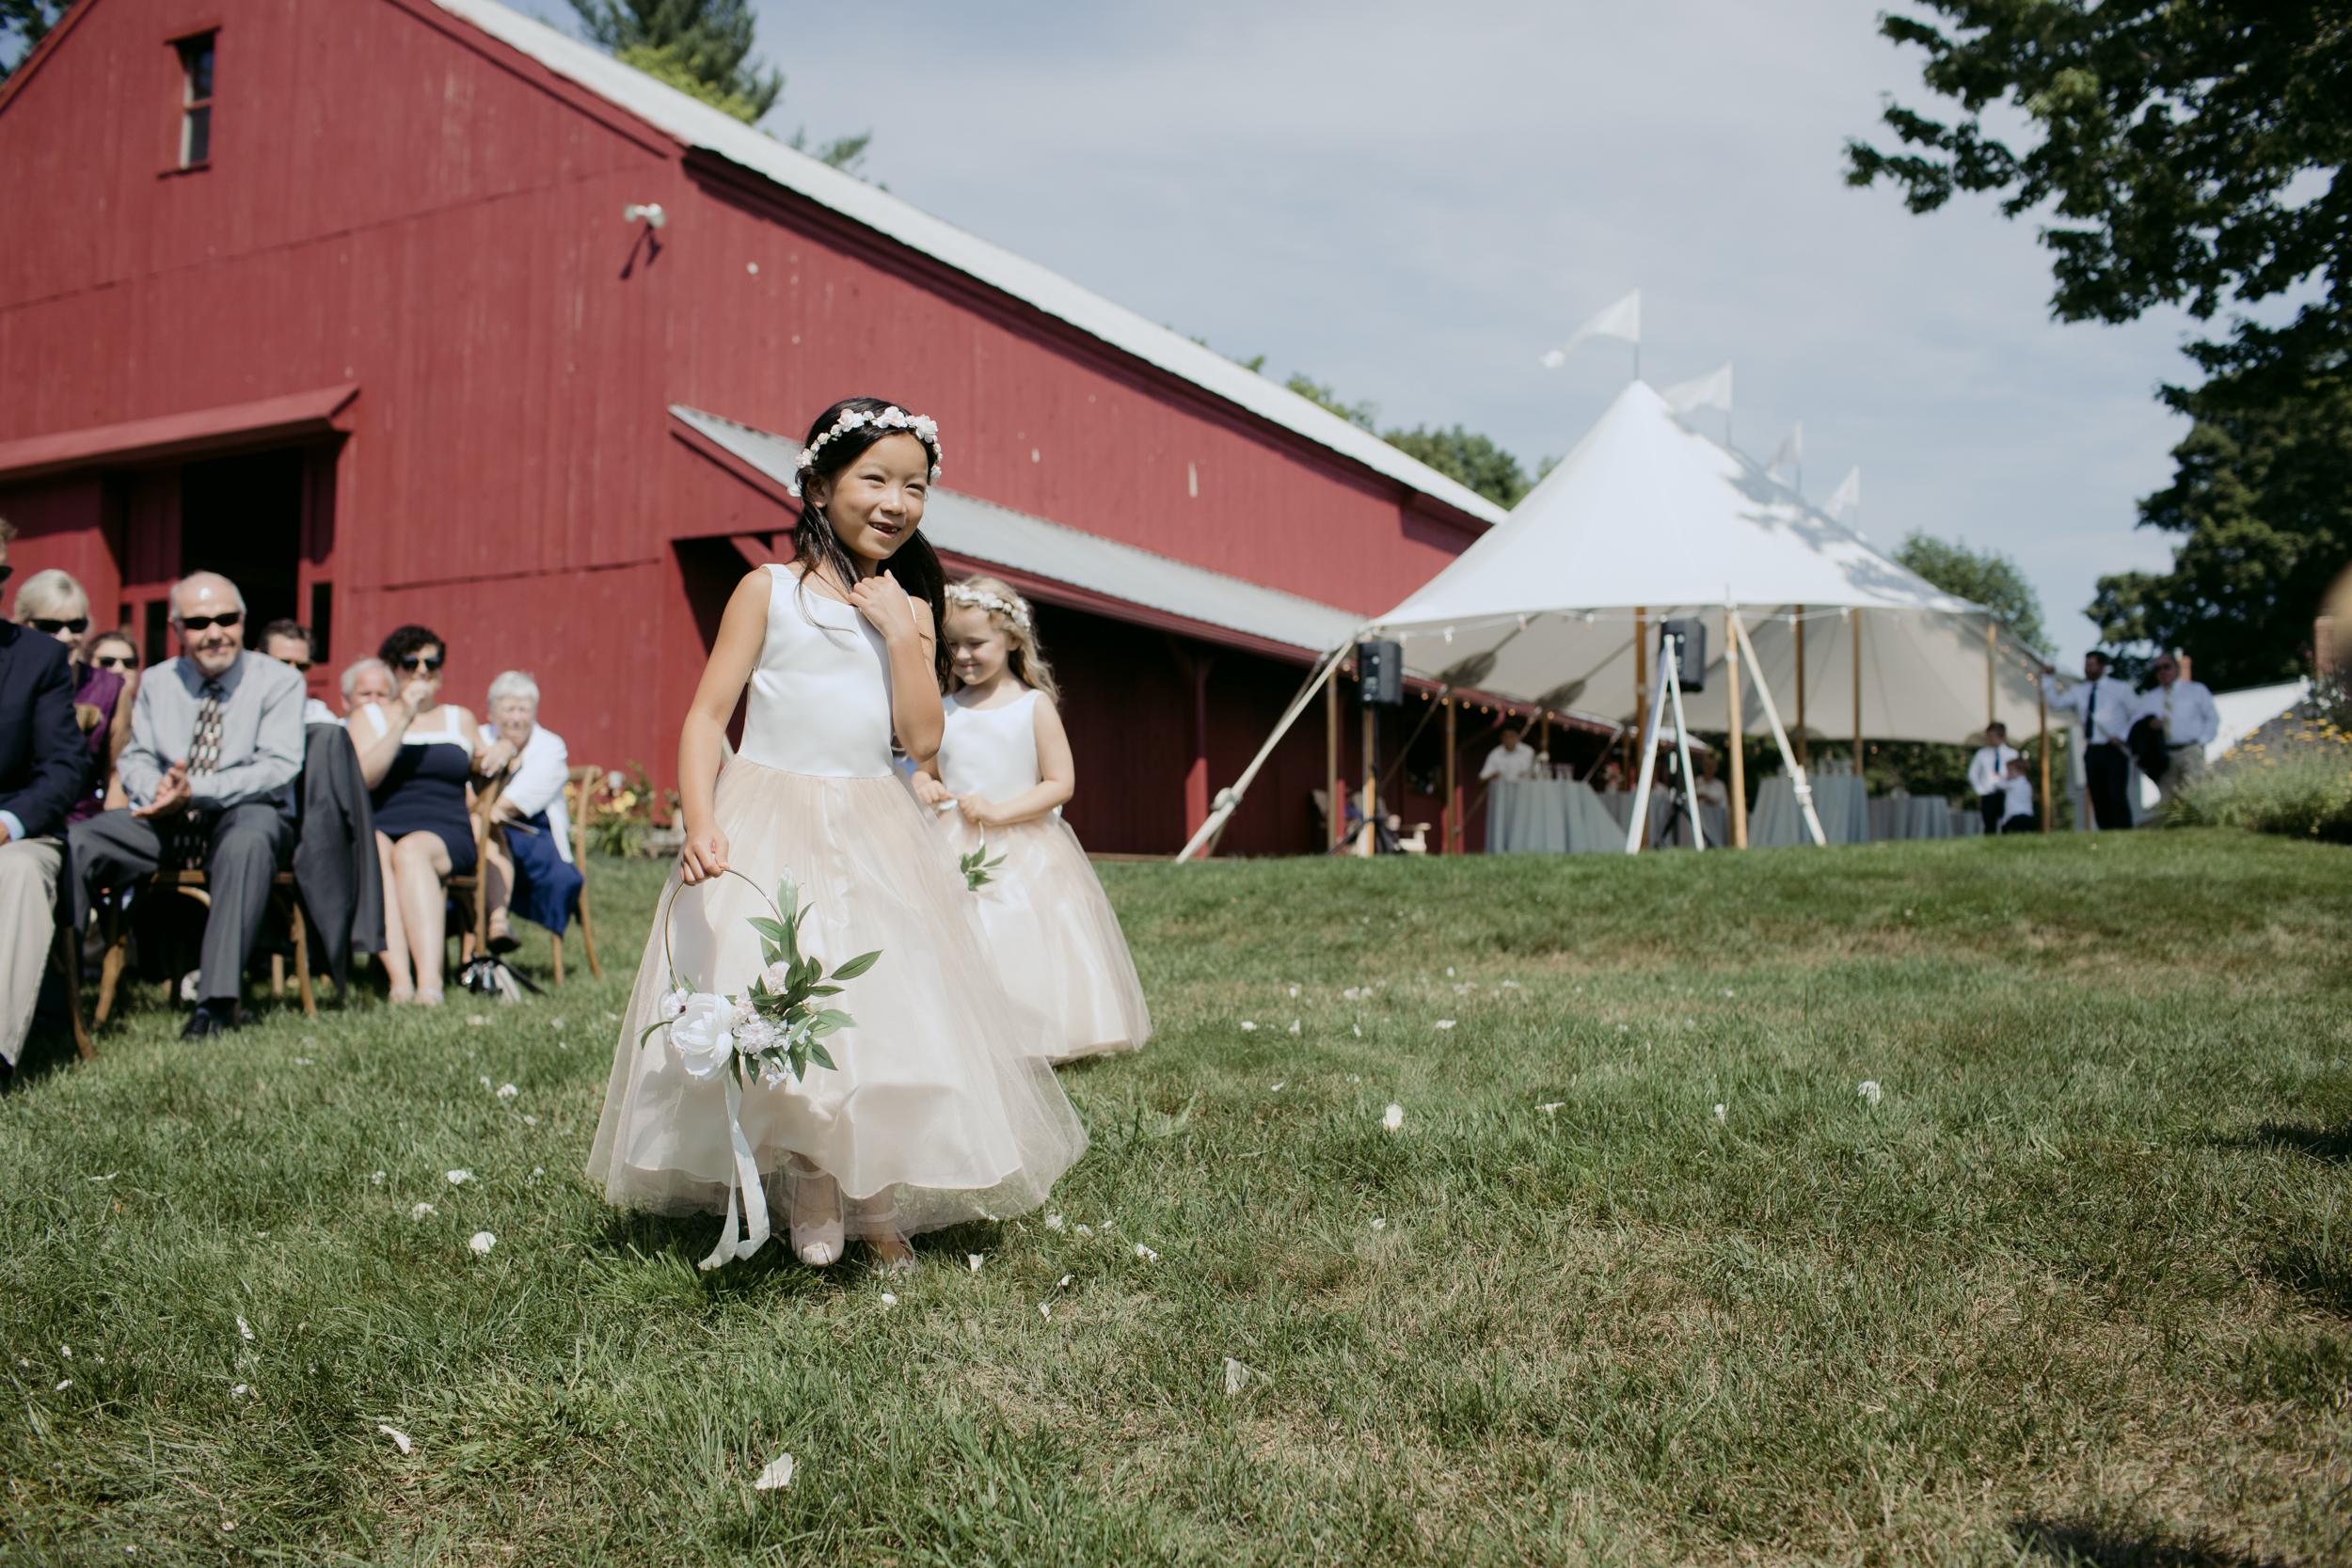 william_allen_farm_wedding_pownal_maine_ilkatayler-14.jpg